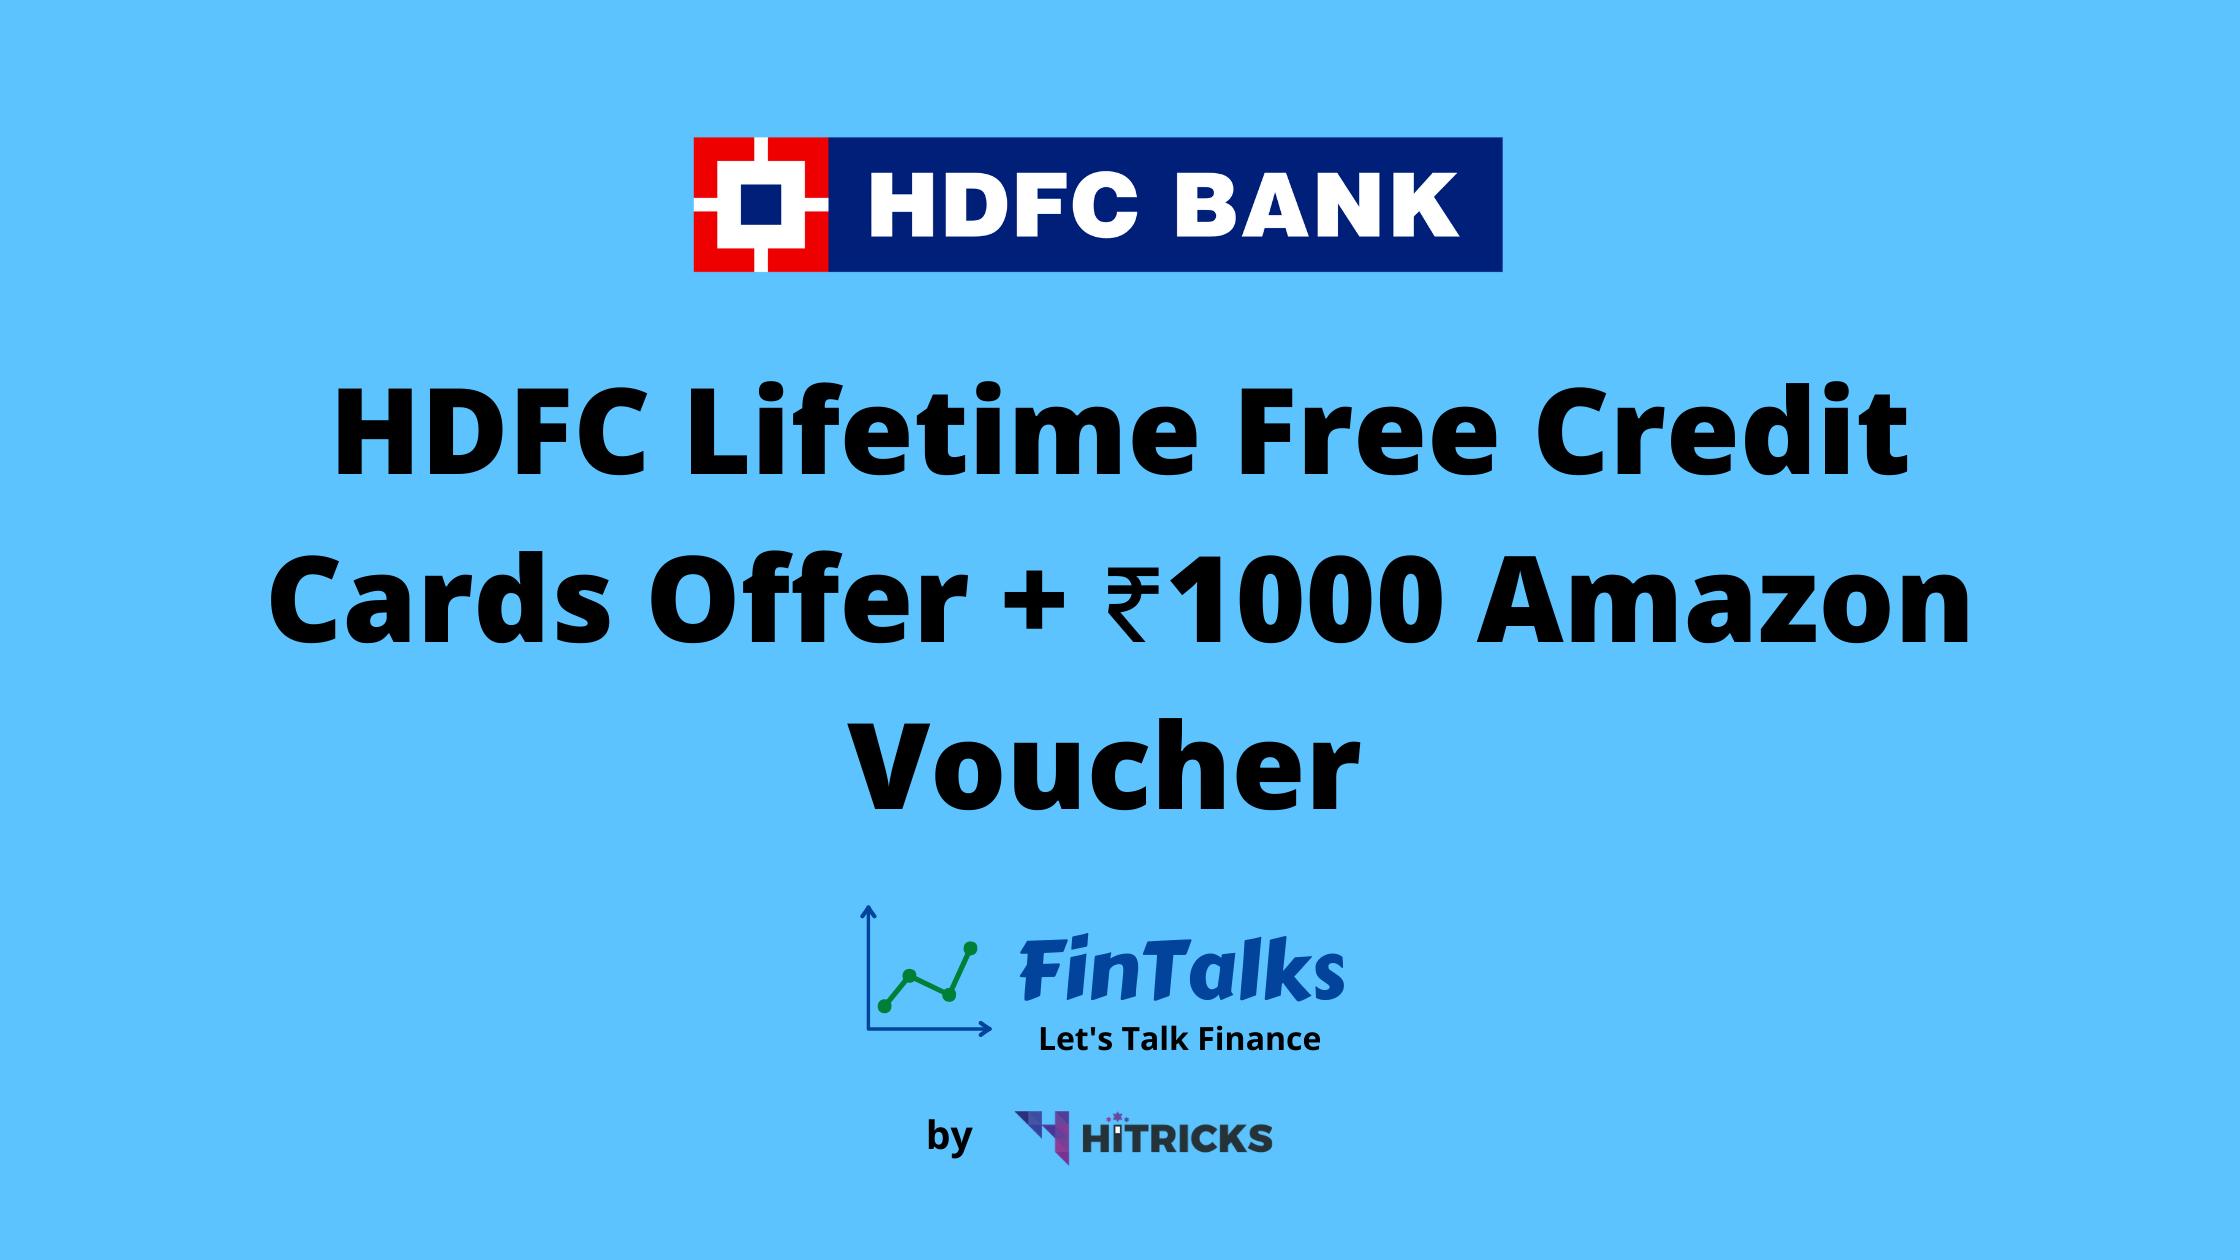 HDFC Lifetime Free Credit Cards Offer + ₹1000 Amazon Voucher